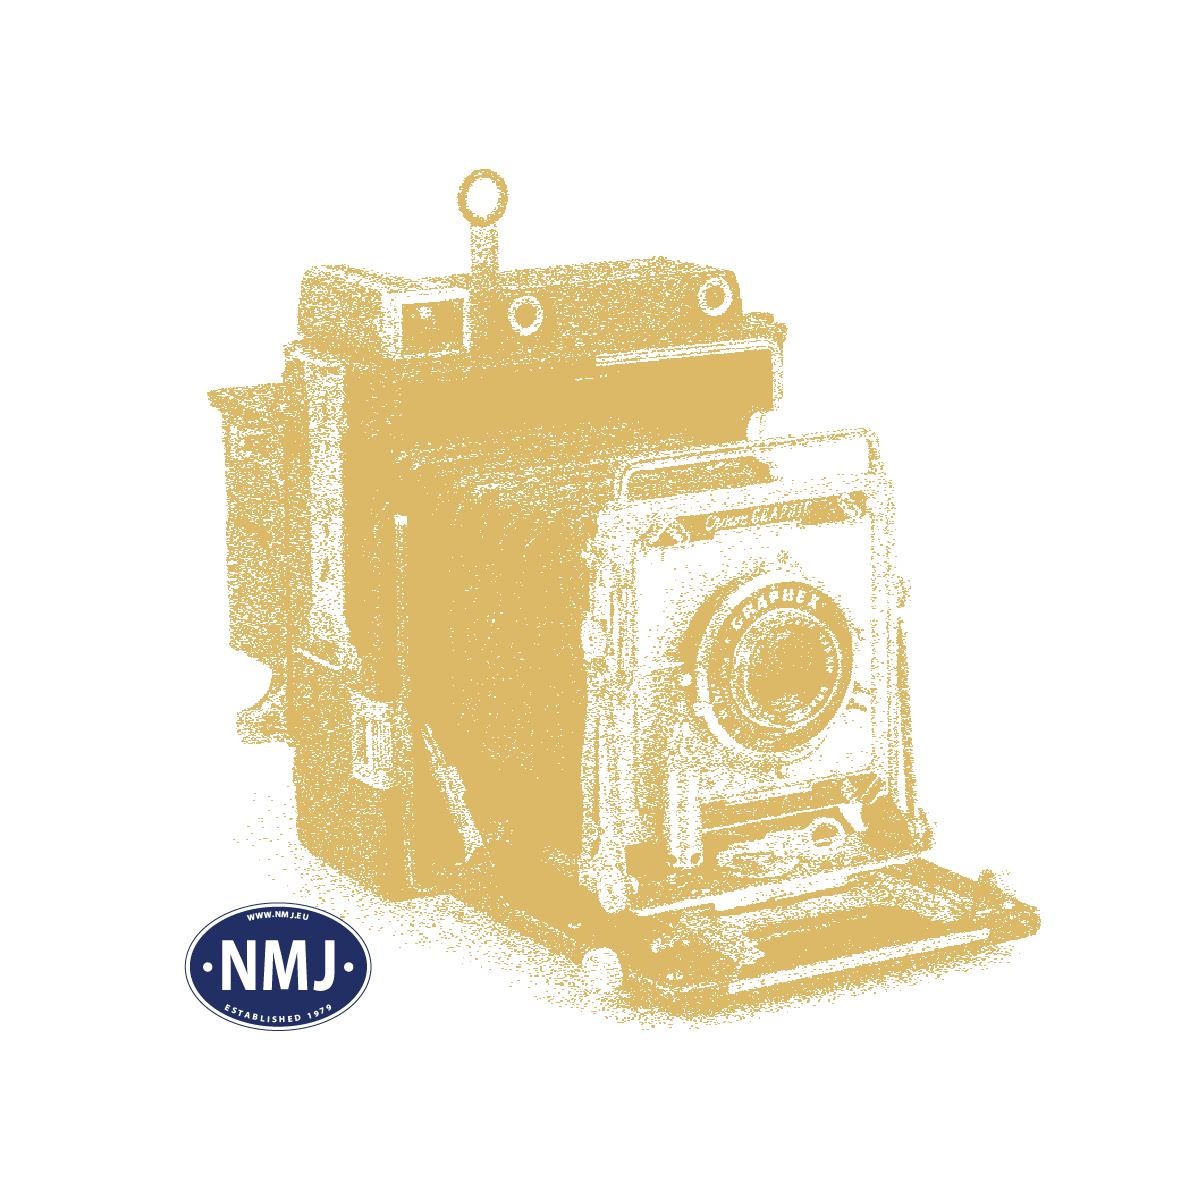 NMJT82.601 - NMJ Topline NSB El13.2156, DC, rot/schwarz